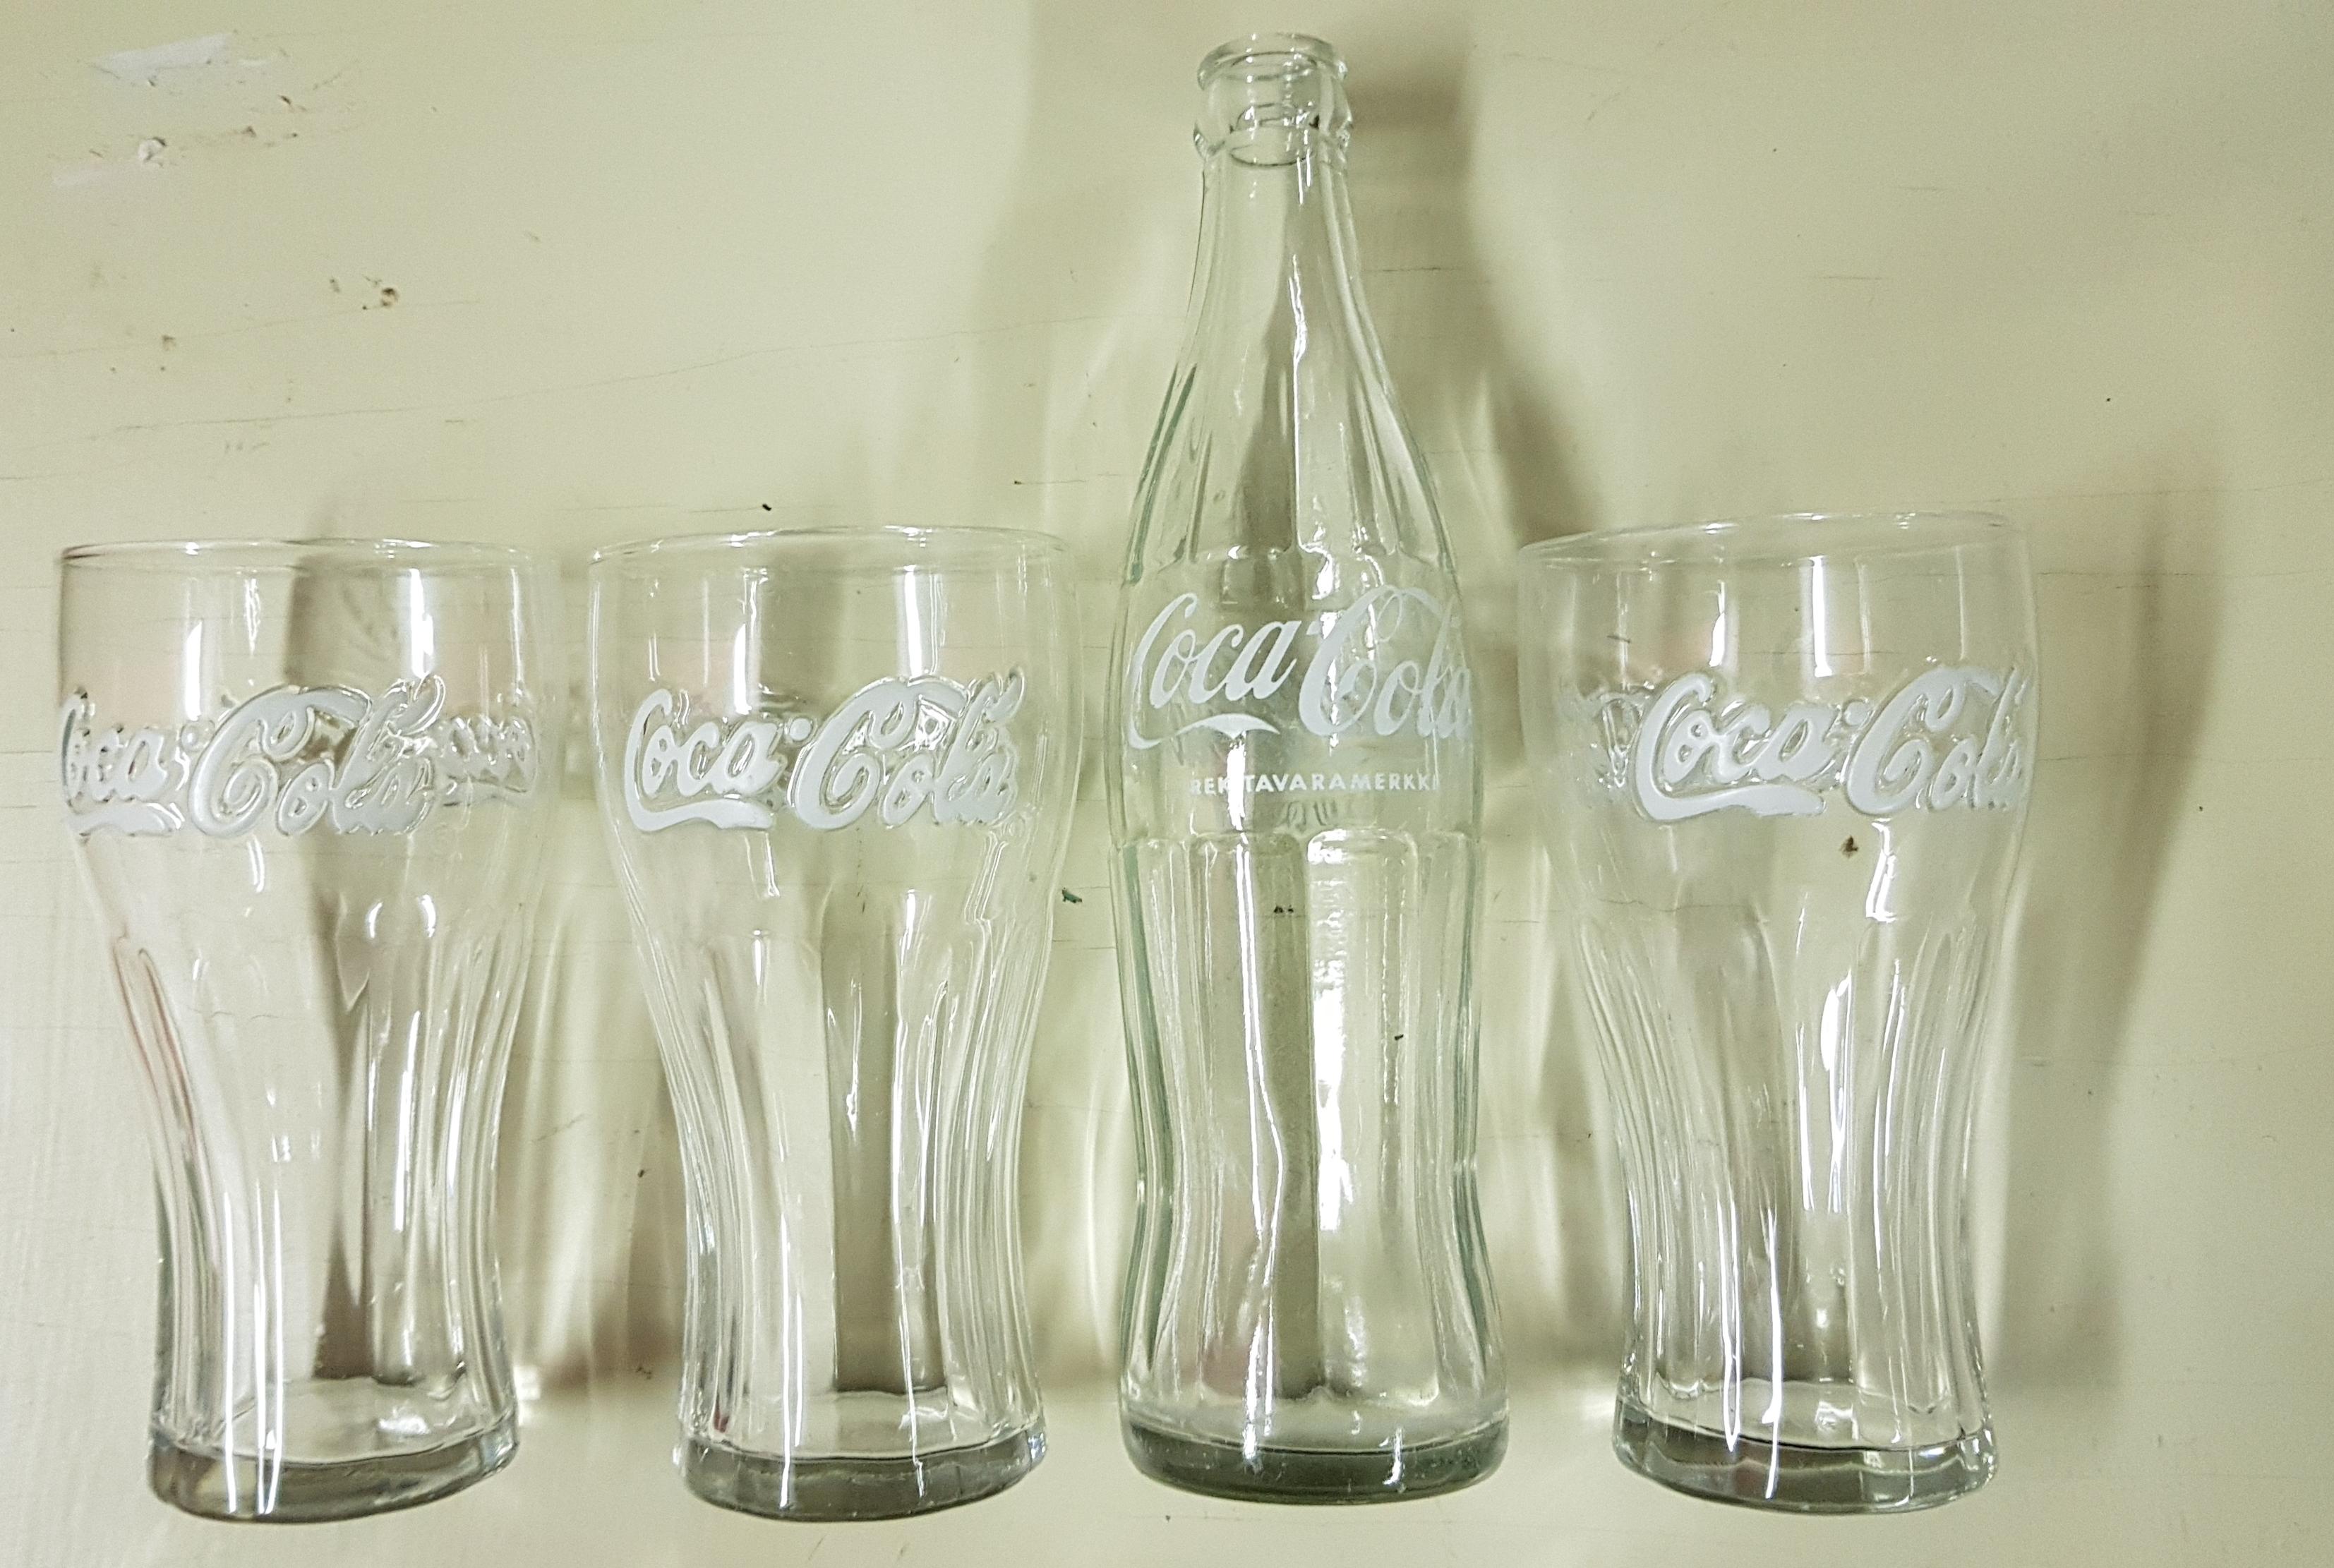 Coca-cola LASIT (3kpl) ja pullo